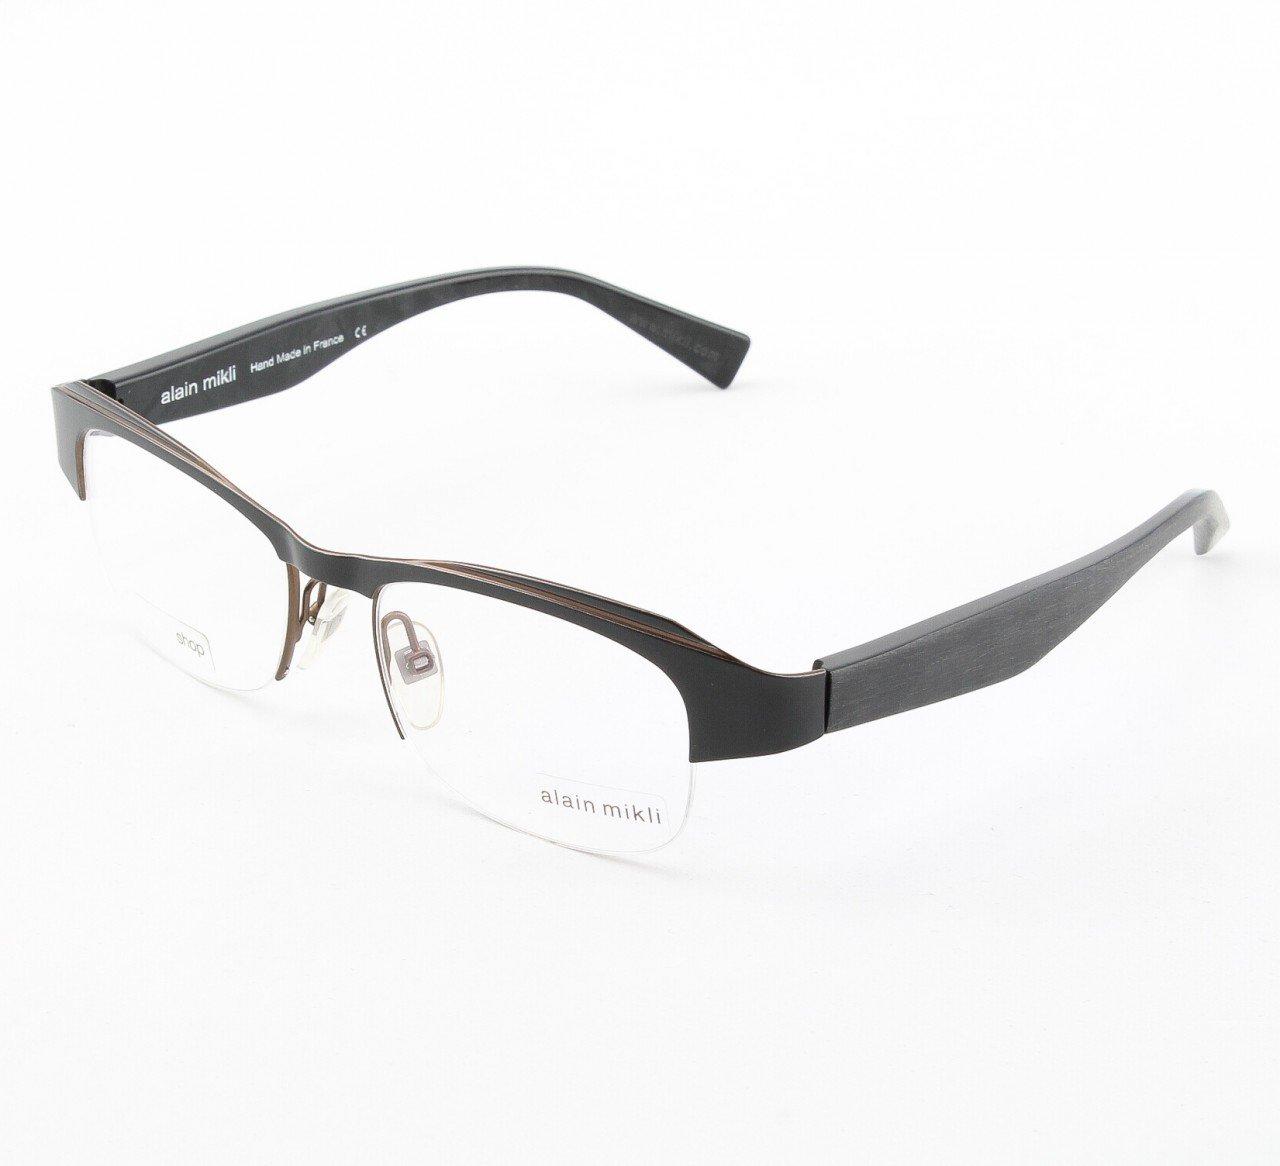 Alain Mikli Eyeglasses AL1041 Col. 1 Black Metal with Copper Accent